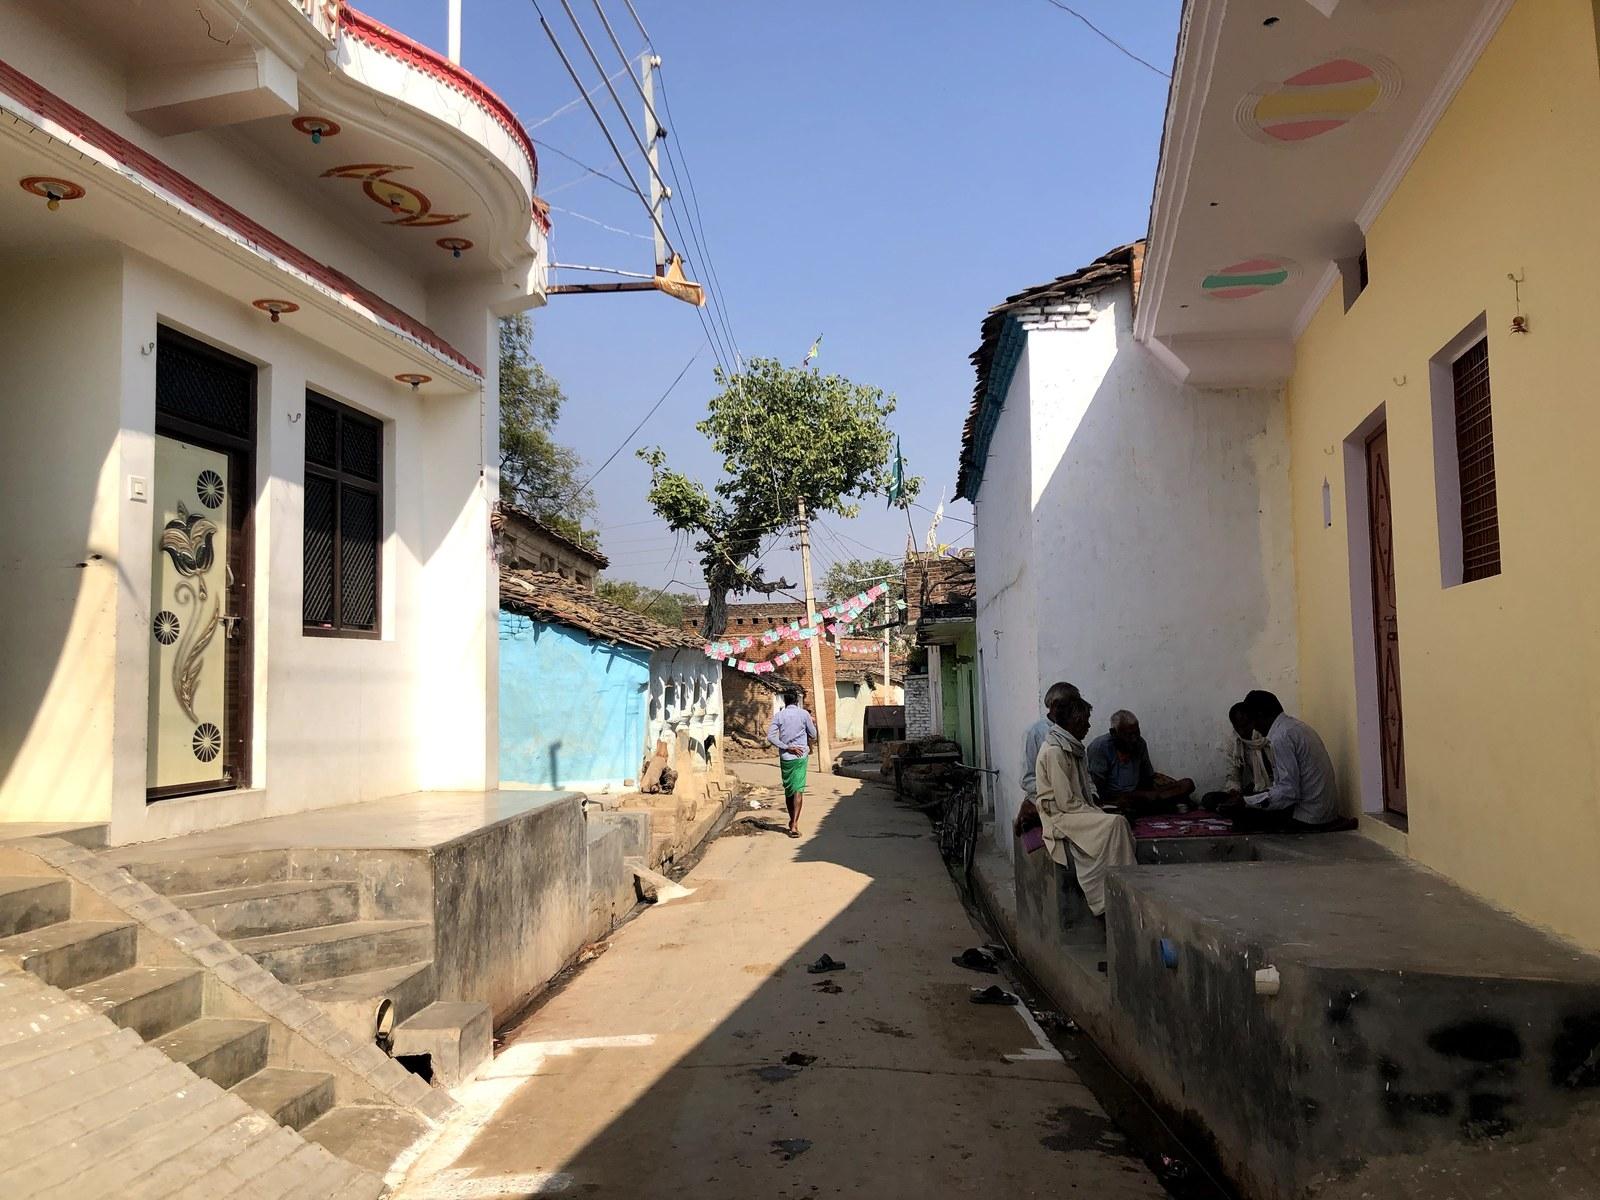 The village of Bara, Uttar Pradesh, India